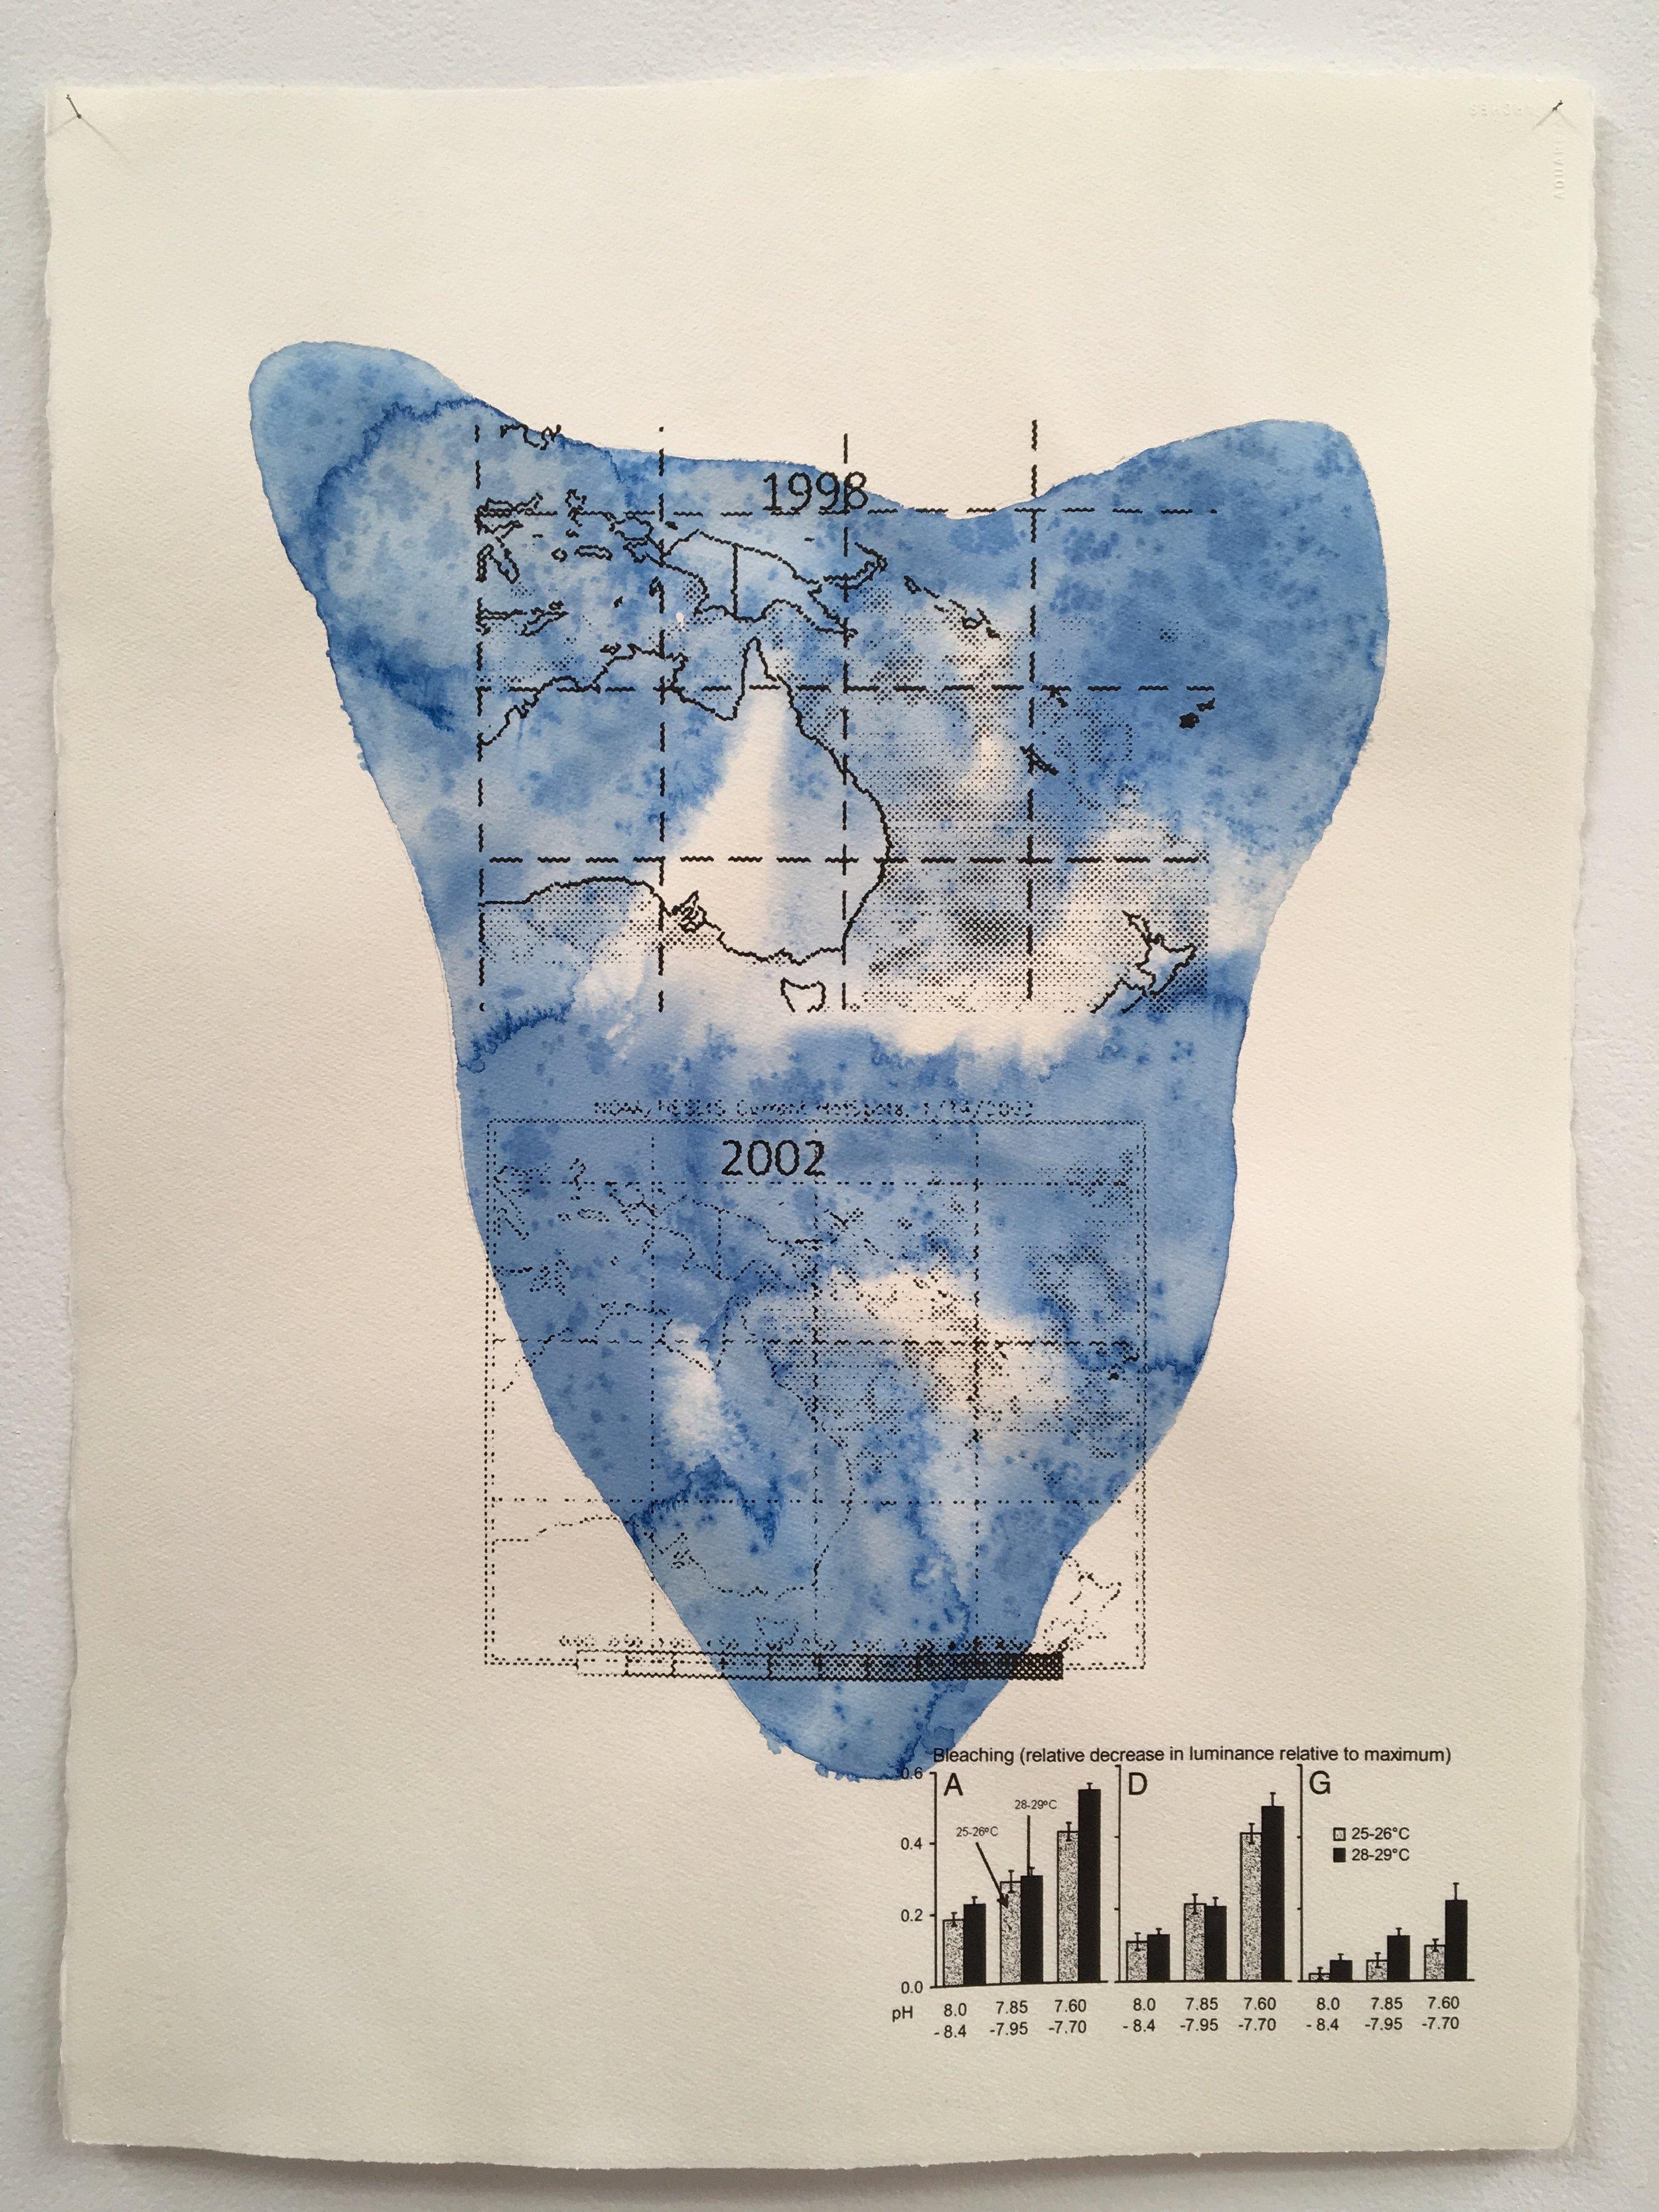 Judy Watson heron island 3 2009-16 acrylic and digital print on paper 77 x 57 cm.jpg